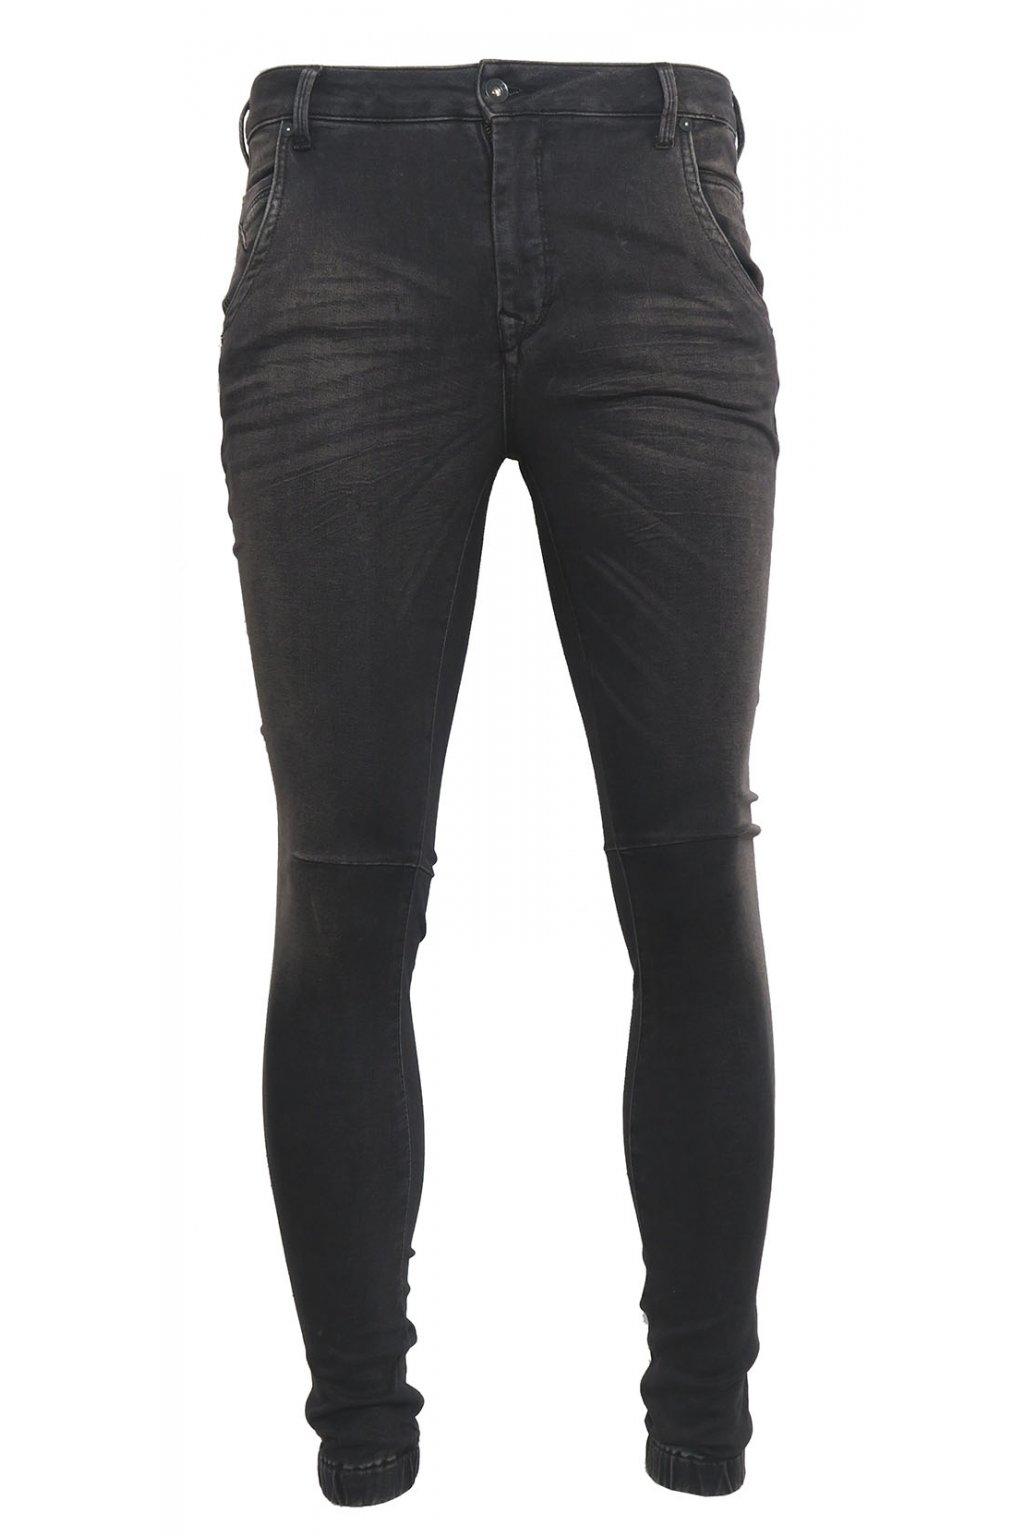 Pánské lehké džíny Pepe Jeans